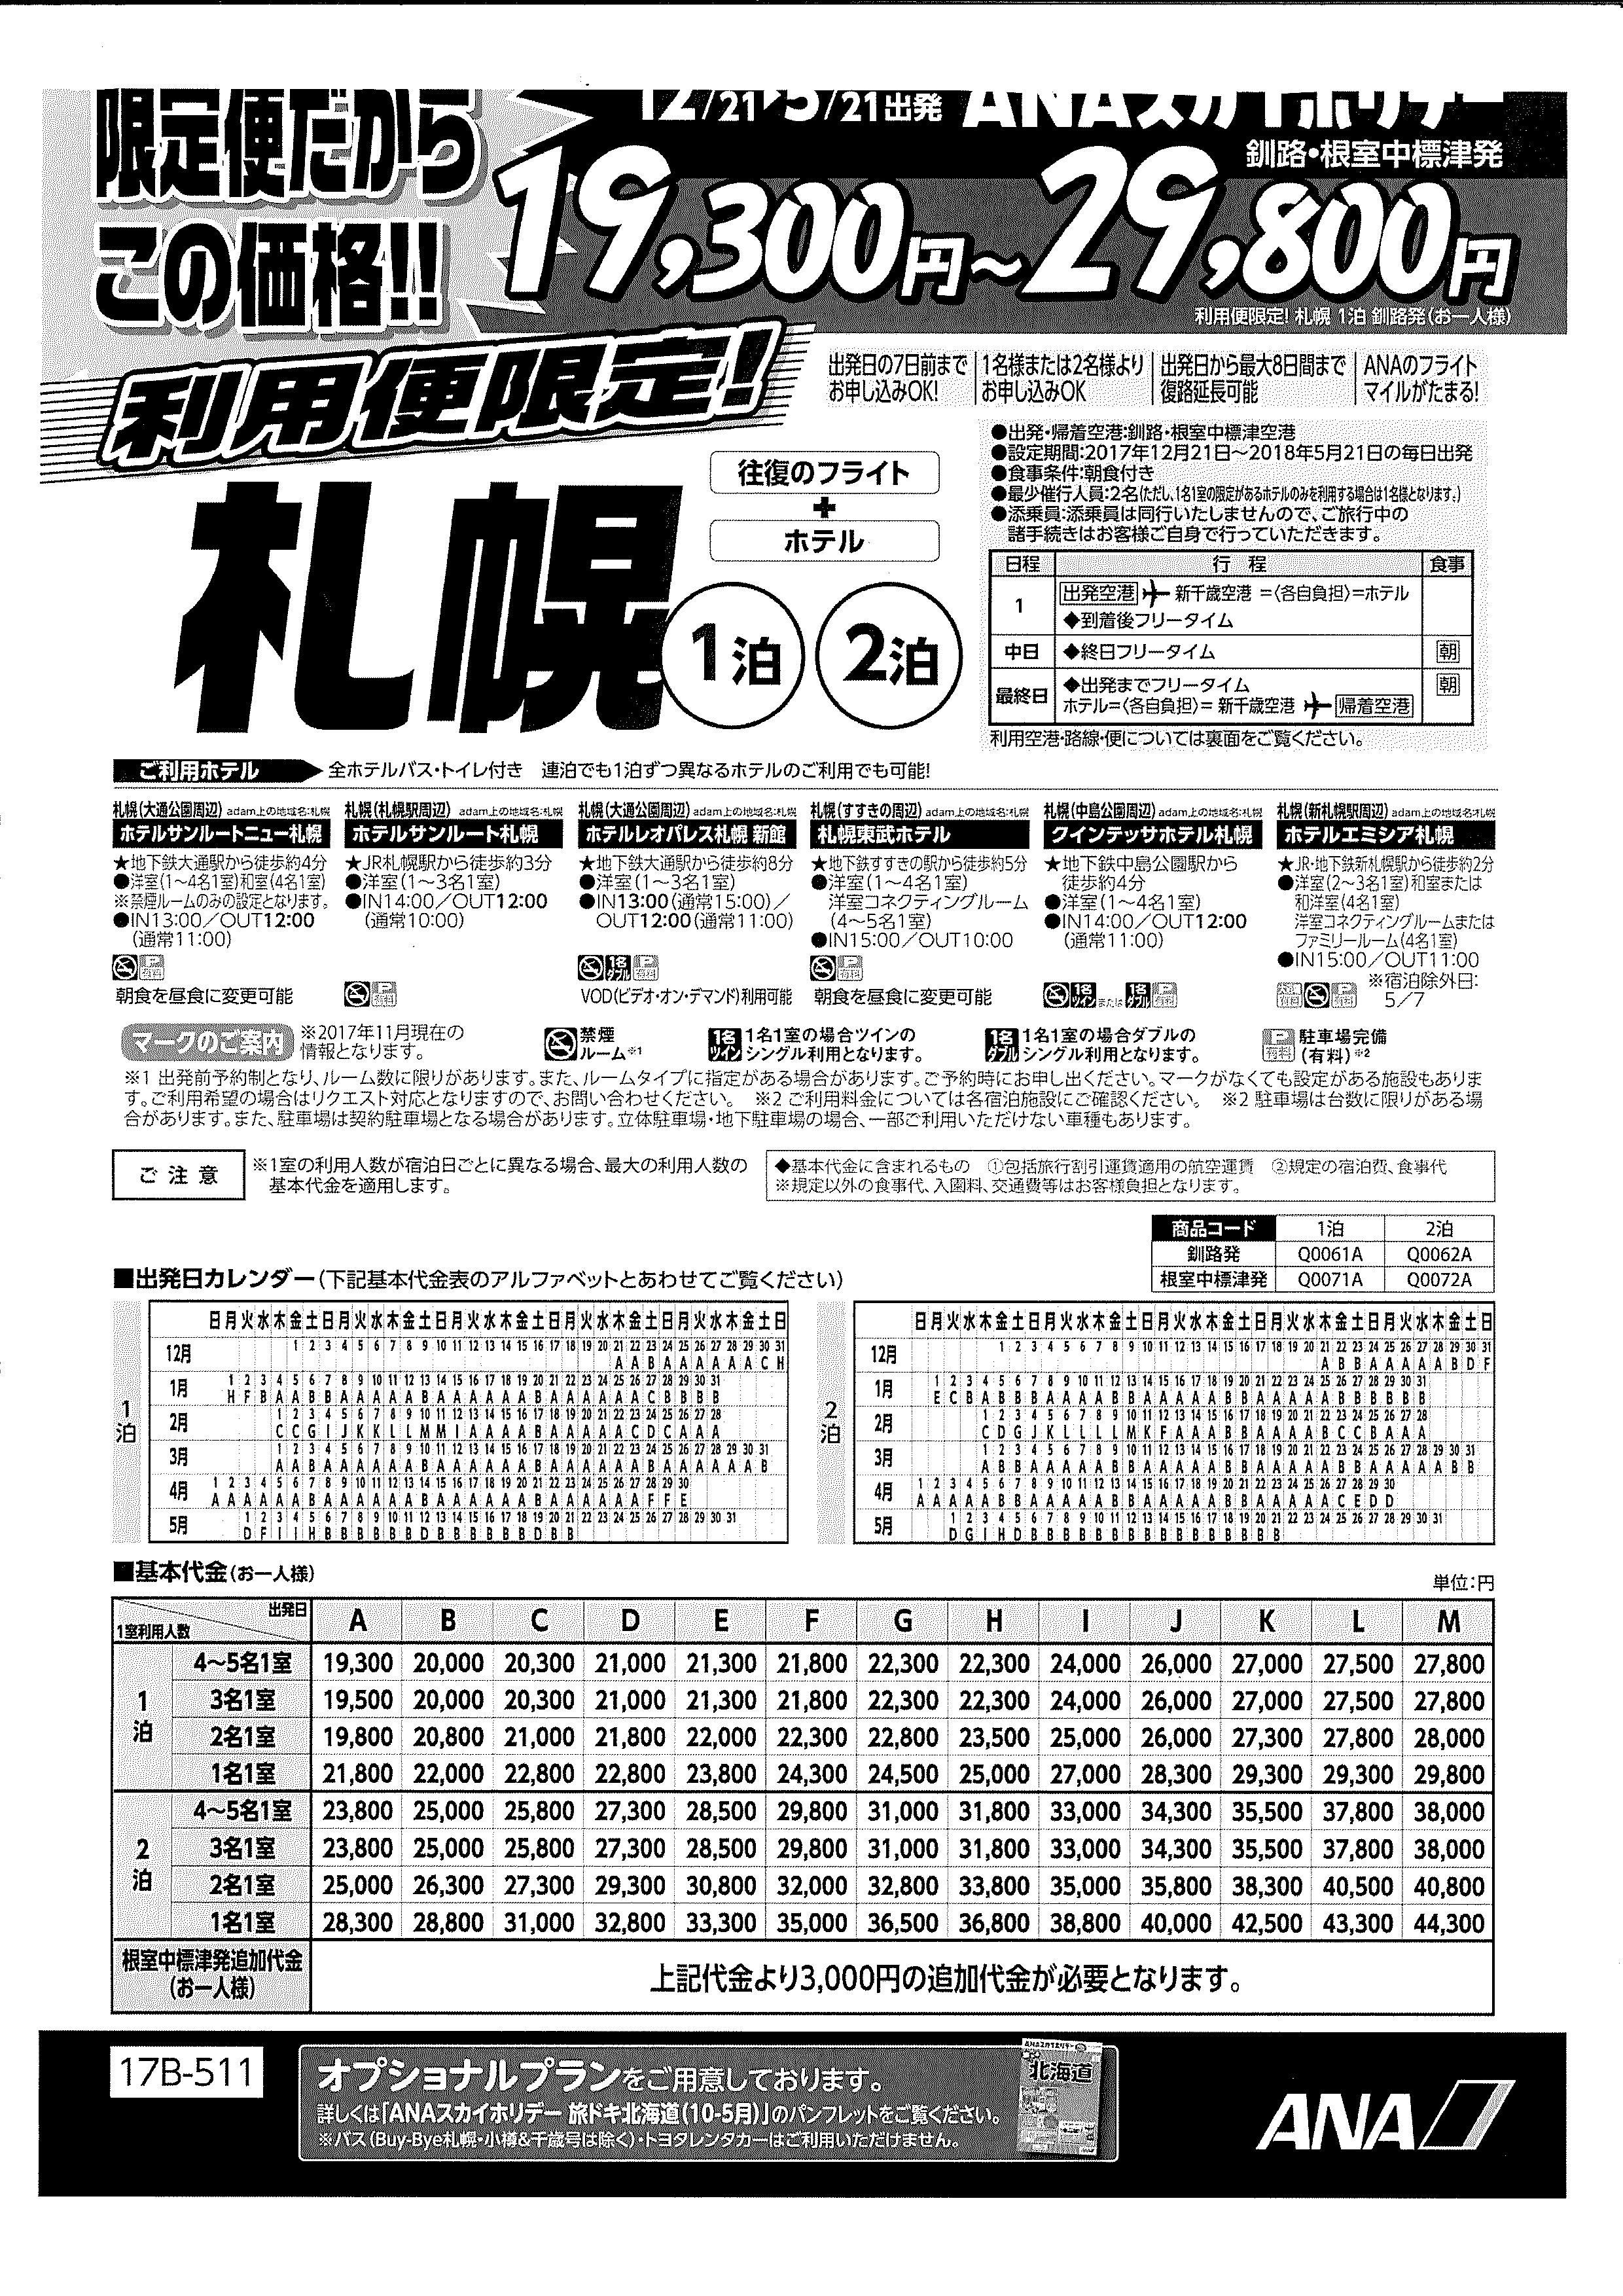 http://www.nakashibetsu-airport.jp/%E6%A0%BC%E5%AE%89%E6%9C%AD%E5%B9%8C%E3%83%91%E3%83%B3%E3%83%95.jpg